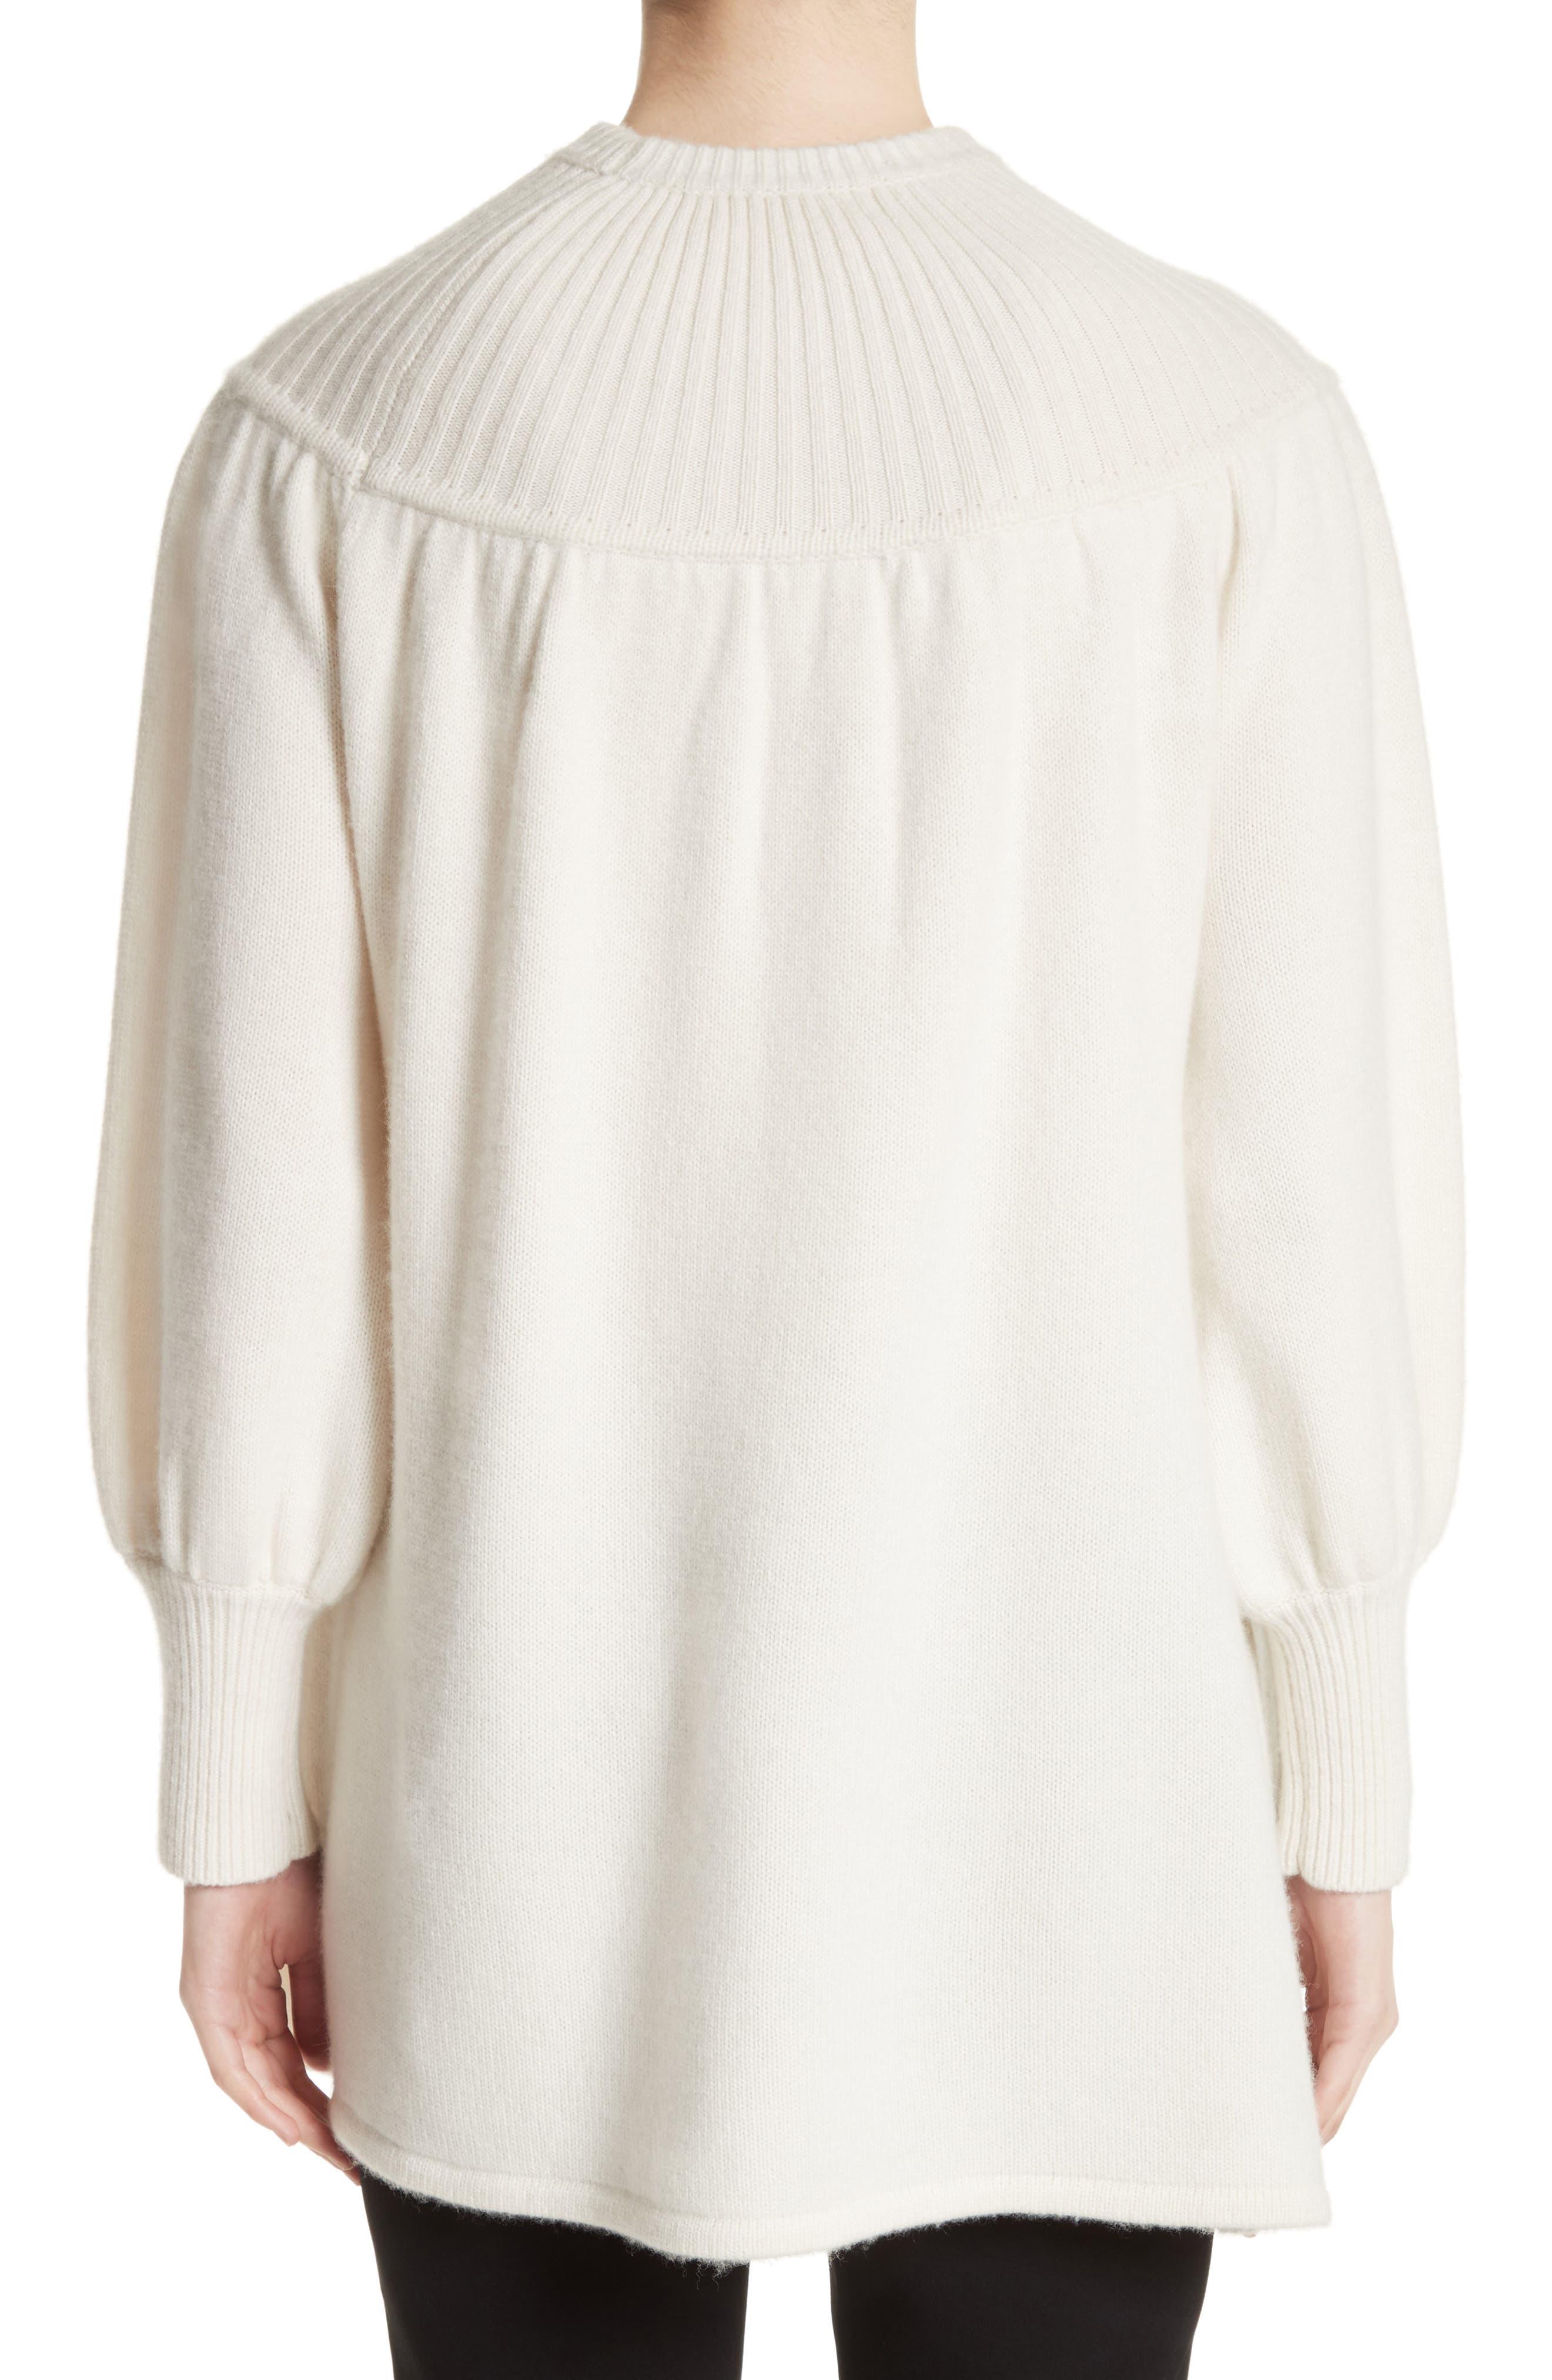 Rib Knit Cashmere Tunic Sweater,                             Alternate thumbnail 2, color,                             Ivory